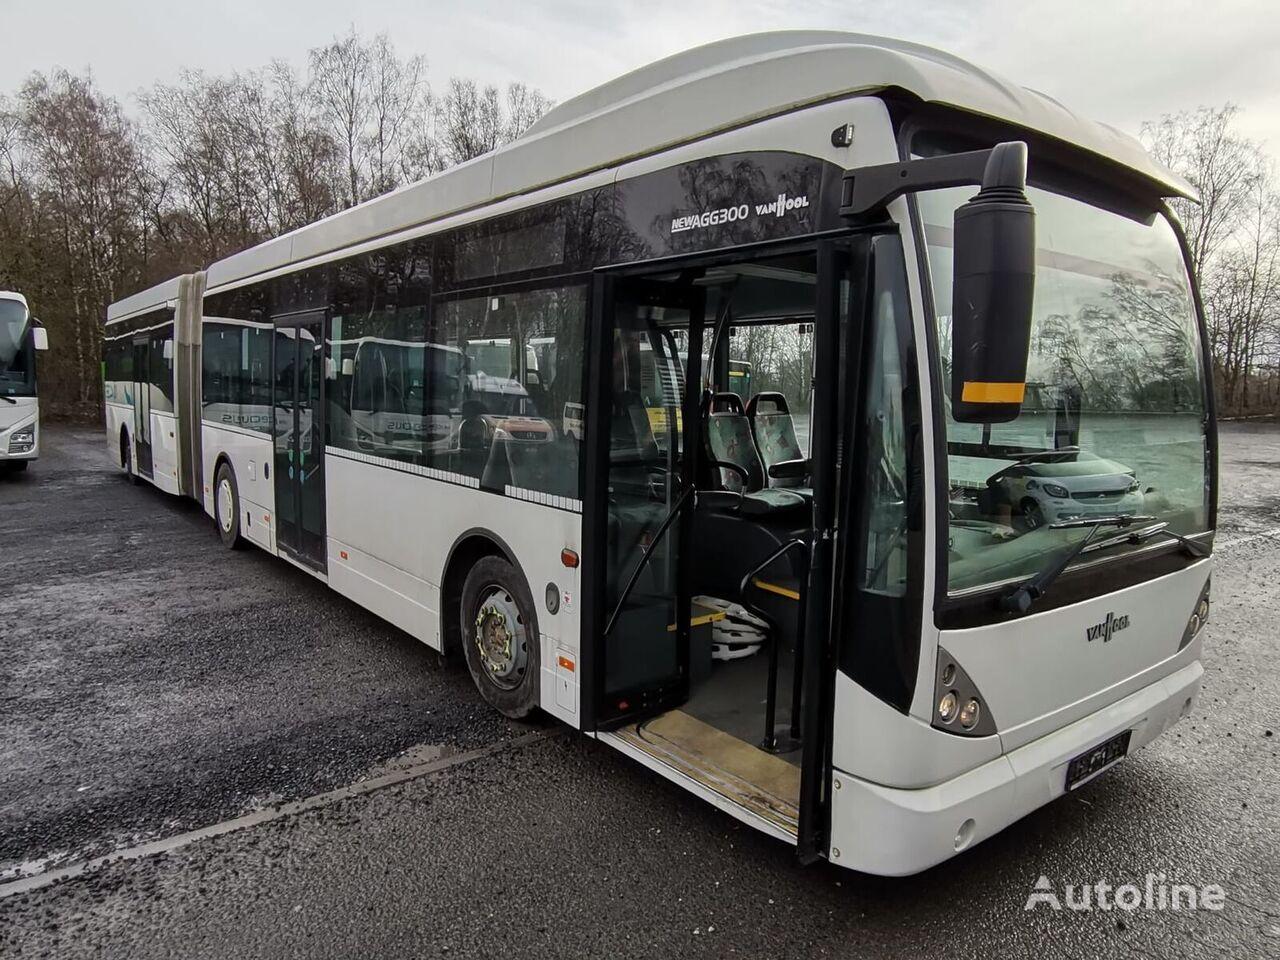 VAN HOOL AG300 autobús articulado